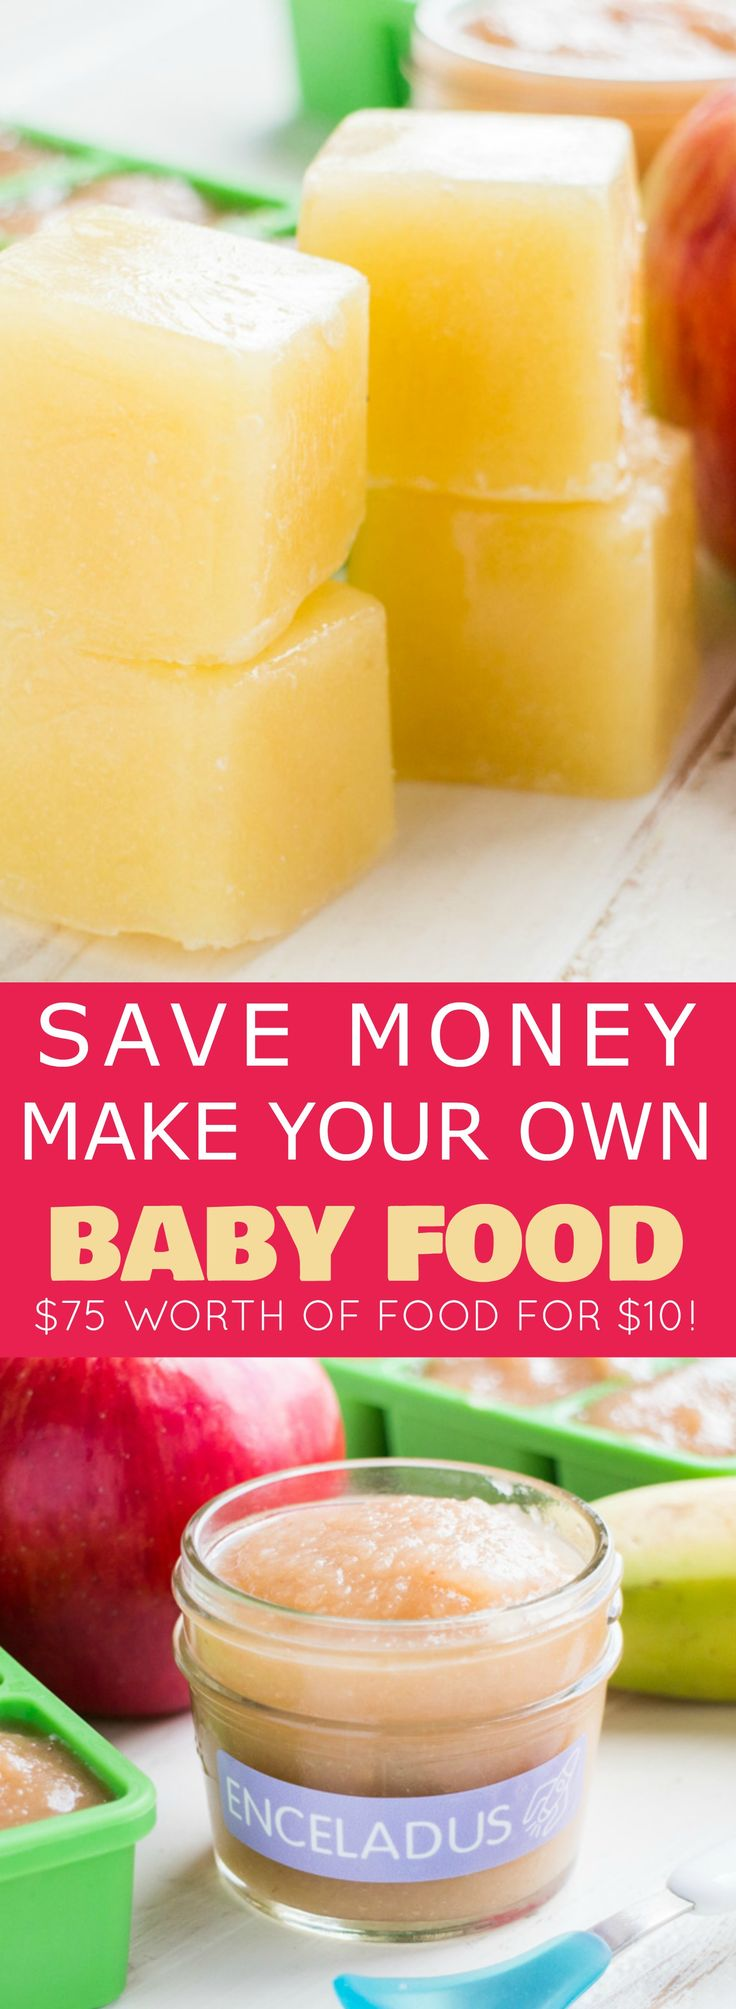 Apple Pear And Banana Baby Food